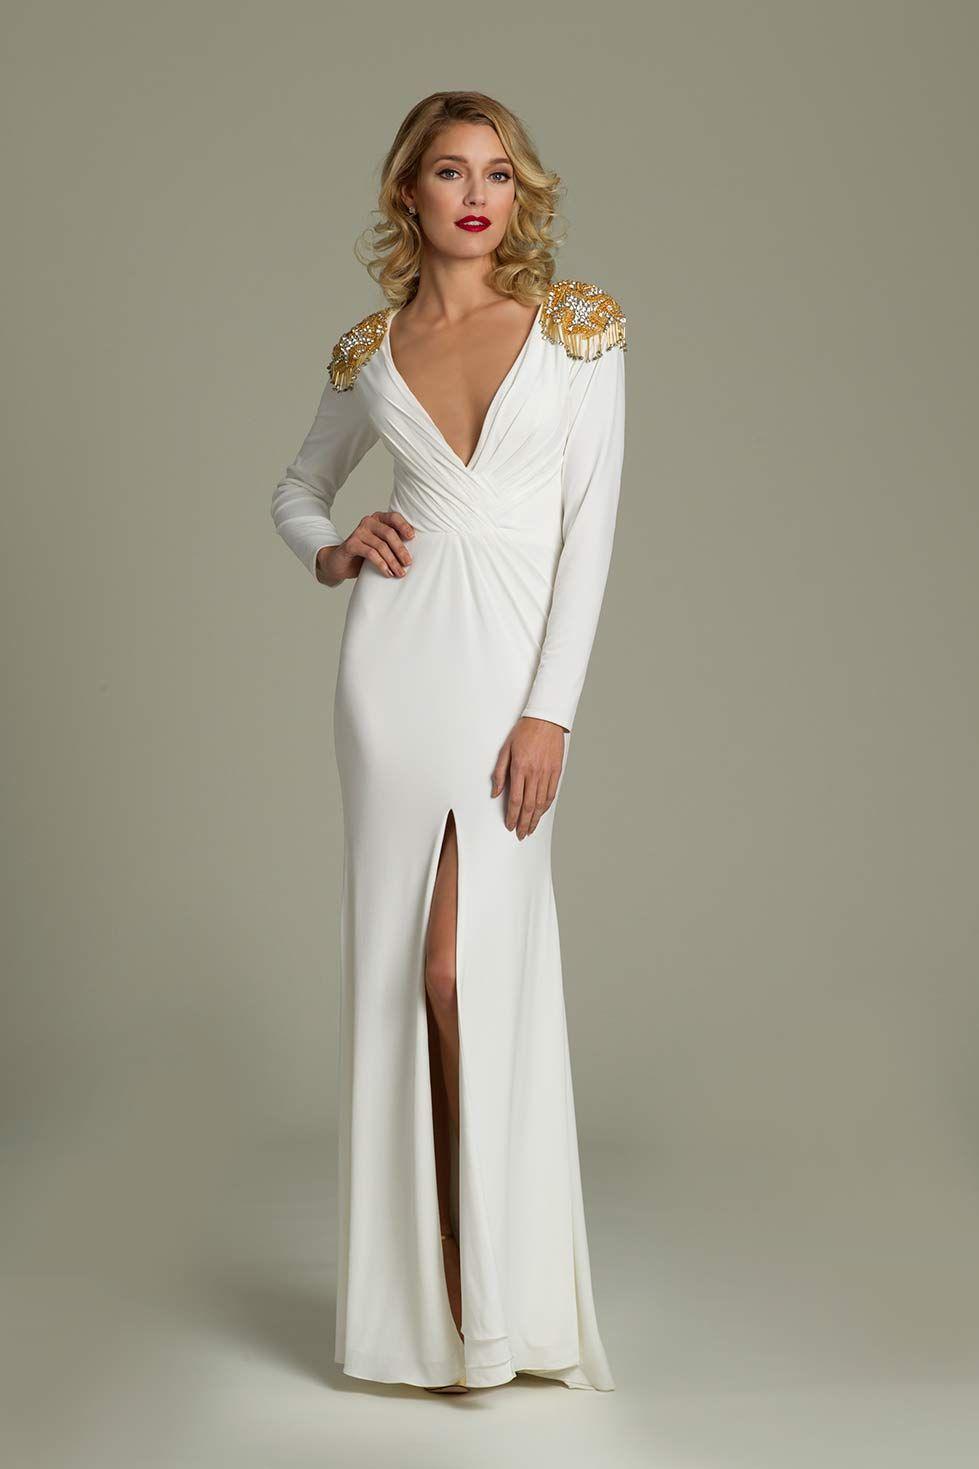 V-neck Jersey Jovani Dress | Joanna -Kruppa;-Mastroianni;Jovani ...